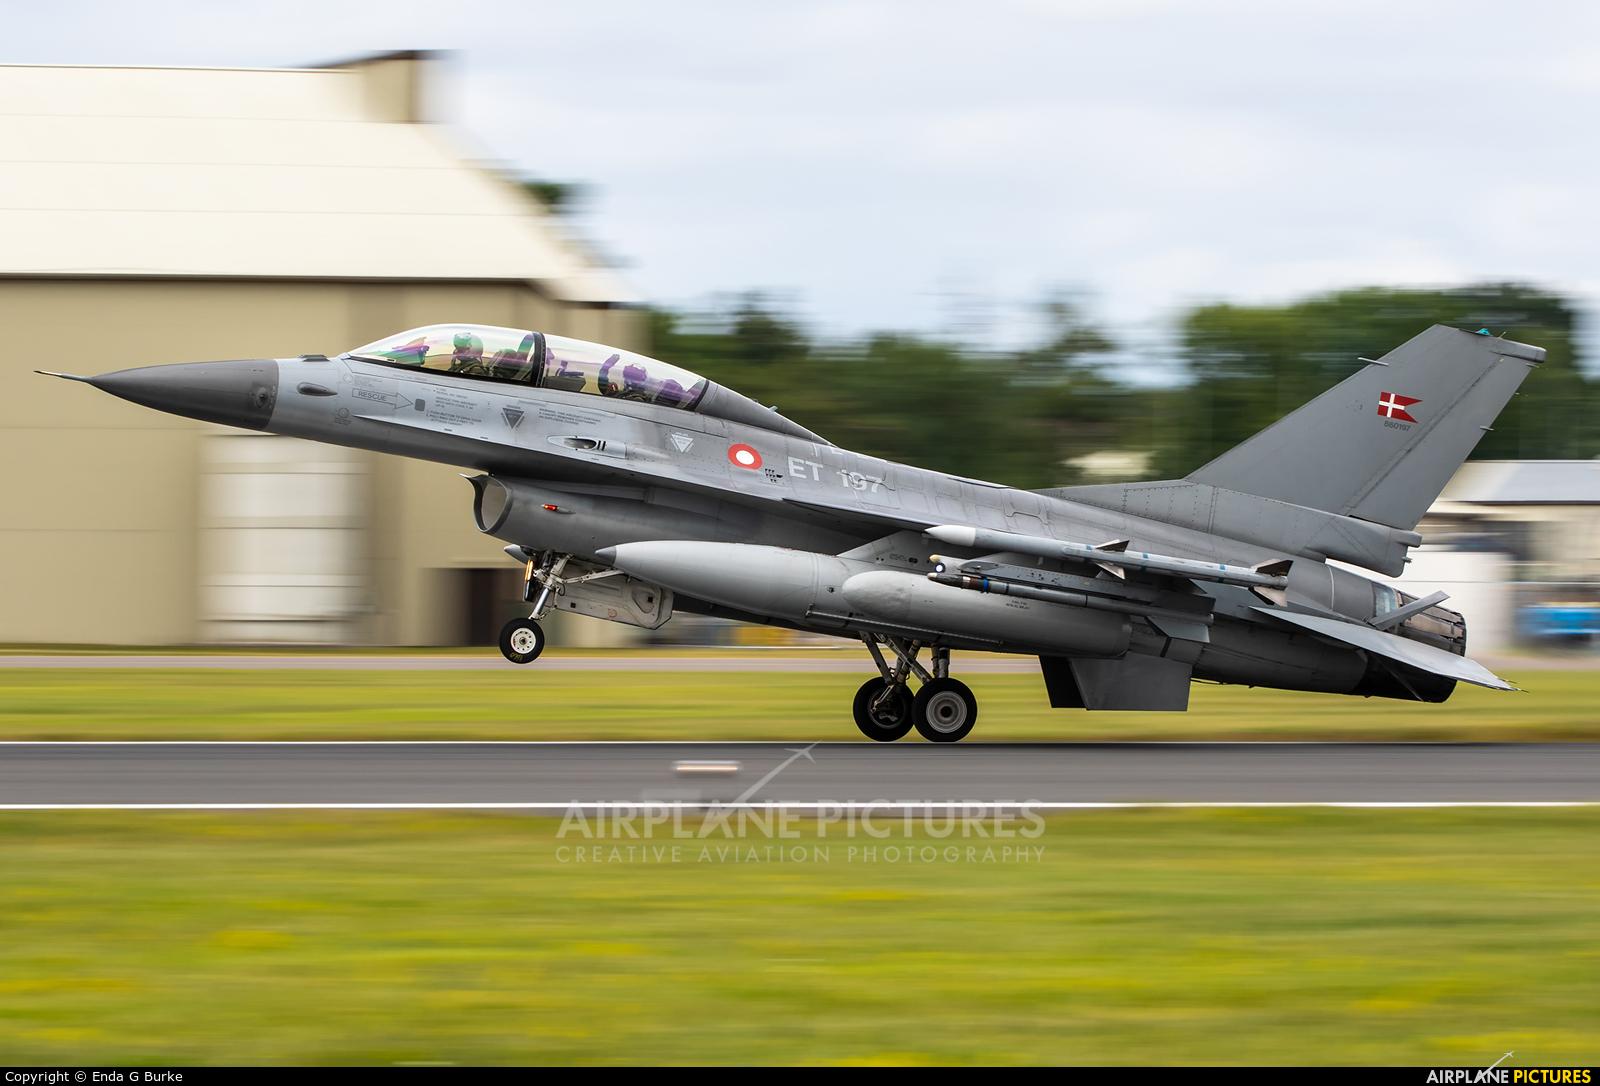 Denmark - Air Force ET-197 aircraft at Fairford